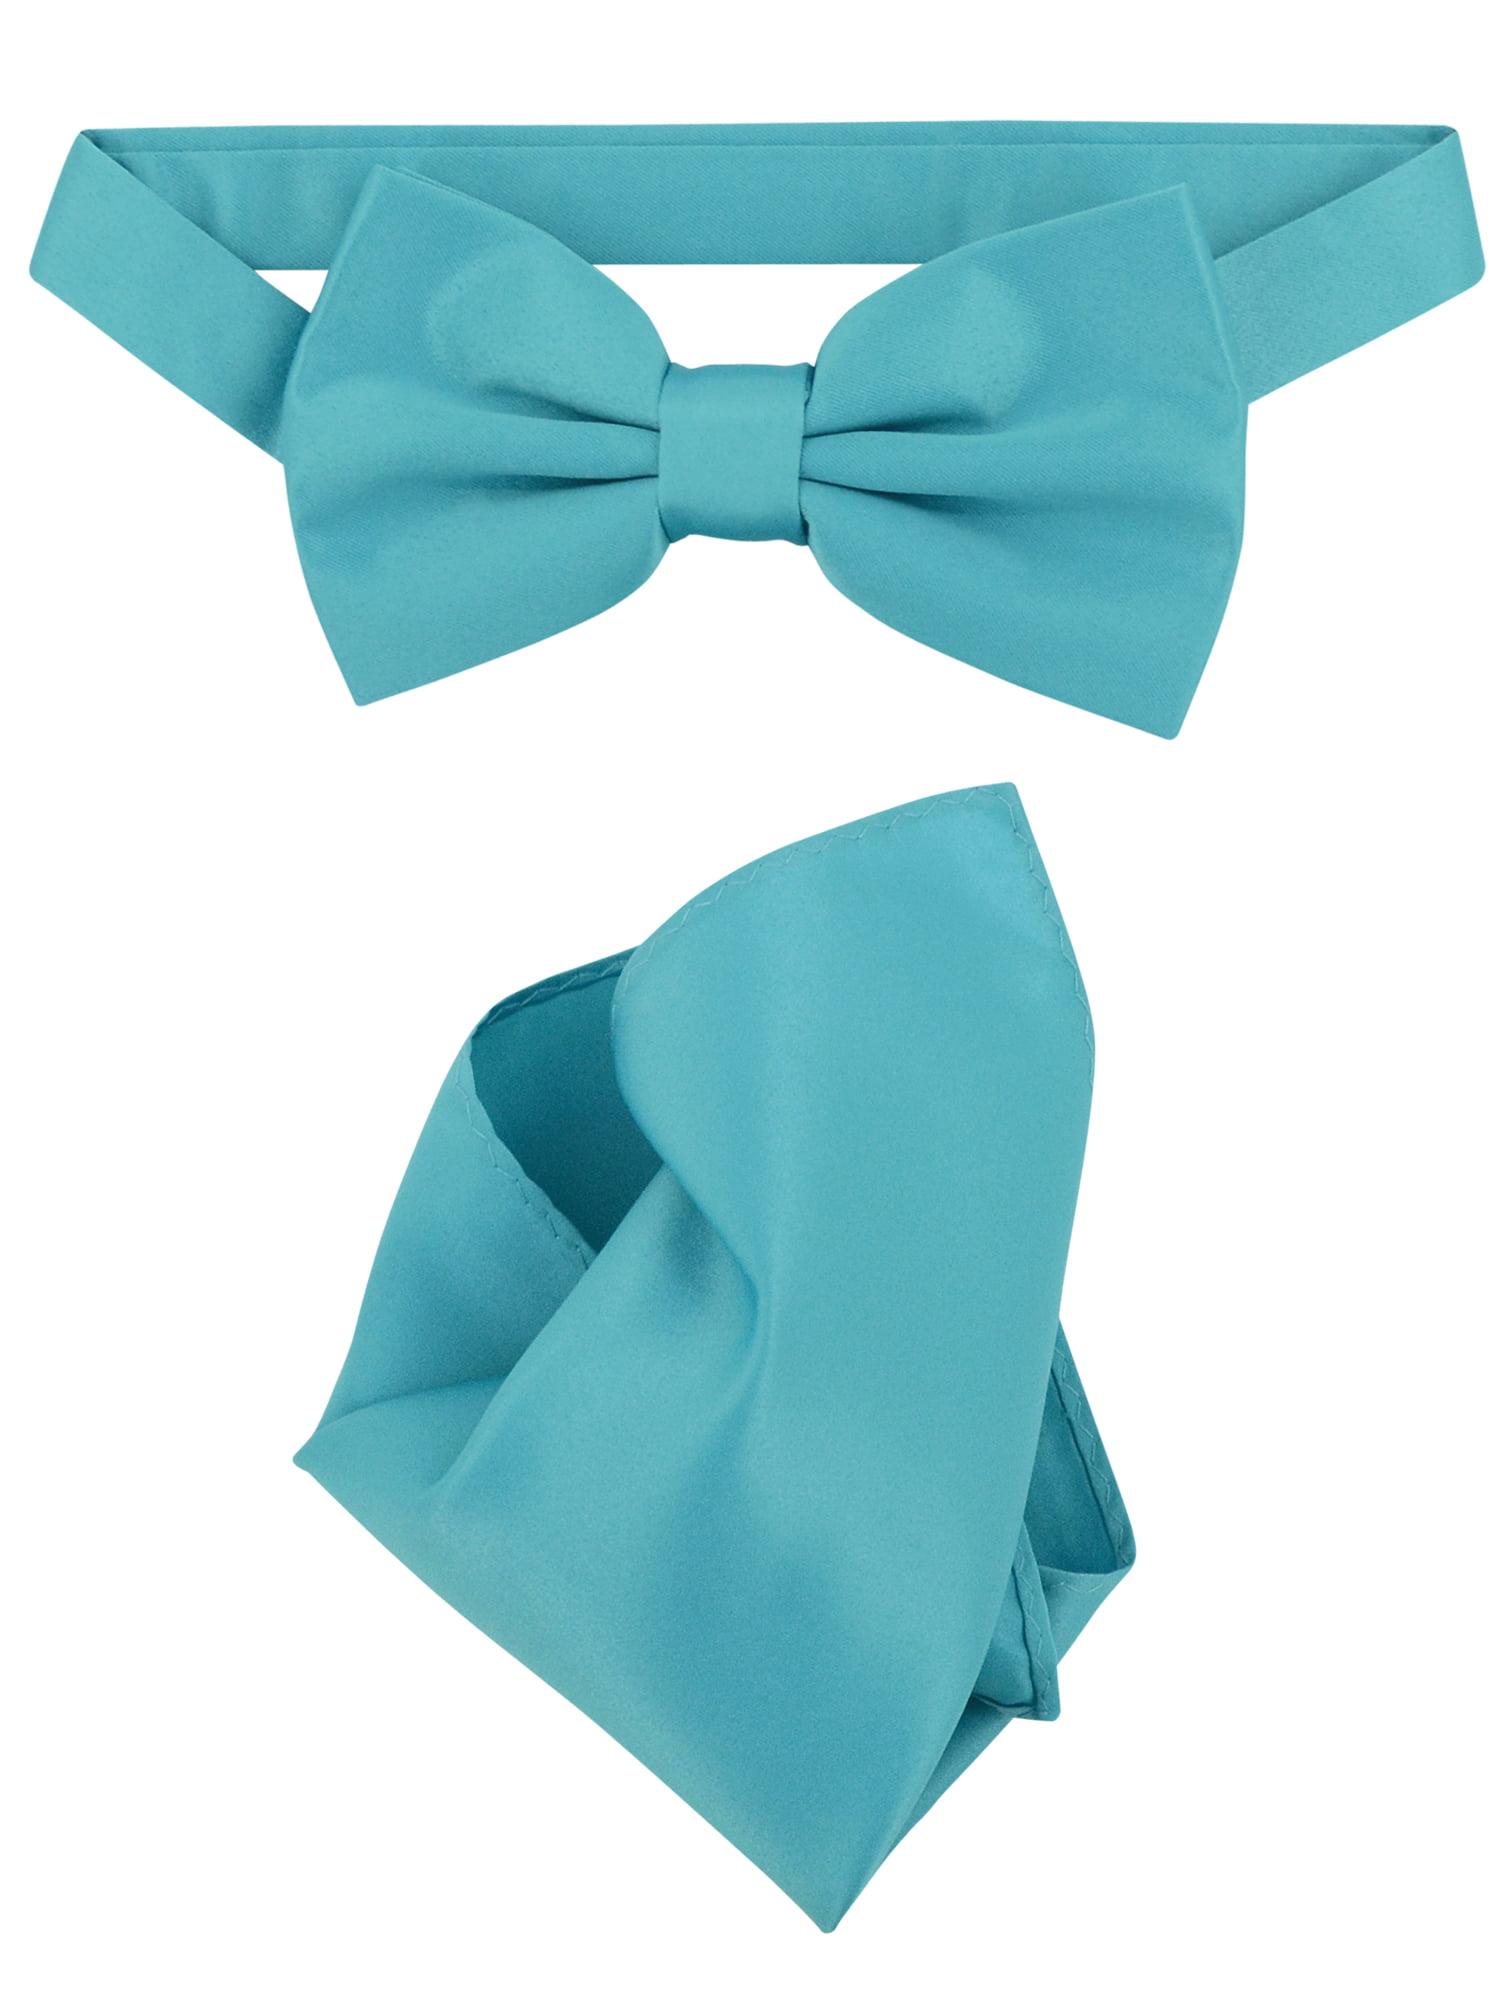 New Teal Turquoise Blue Bow Tie Suspender set Formal Men Wedding  USA SELLER